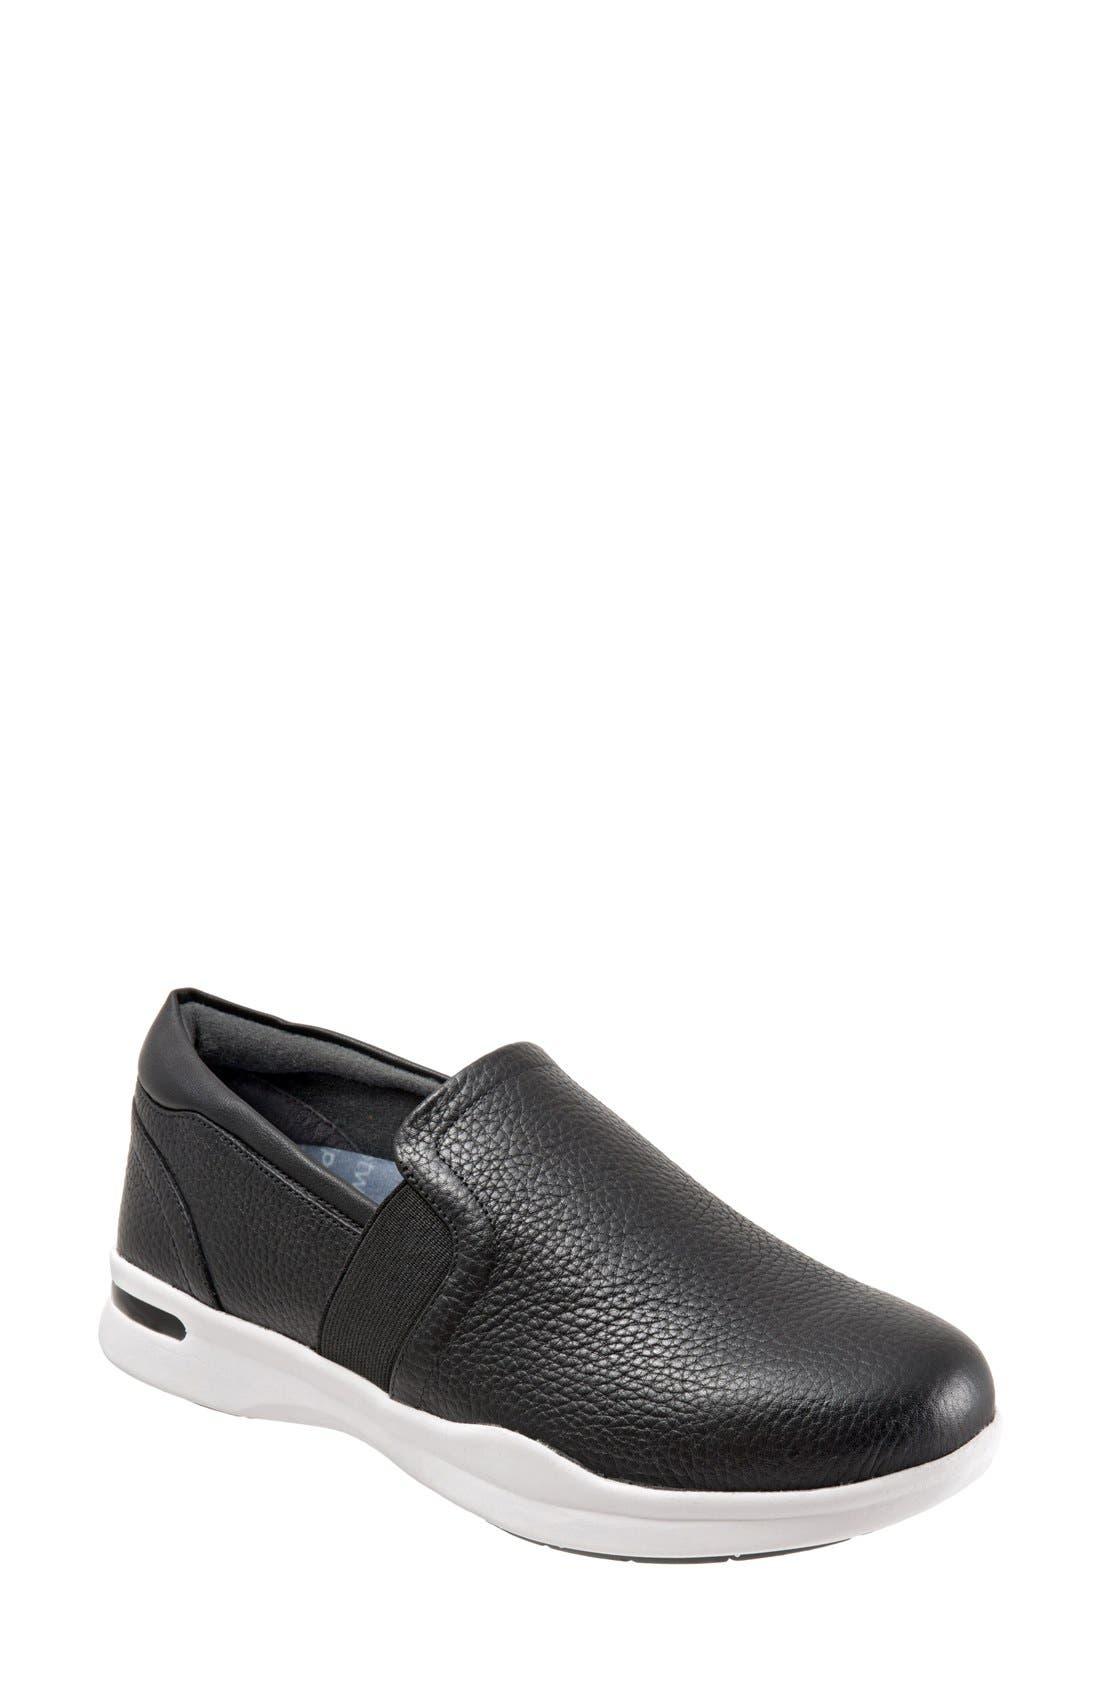 SOFTWALK<SUP>®</SUP>, 'Vantage' Slip-On Sneaker, Main thumbnail 1, color, BLACK / WHITE LEATHER